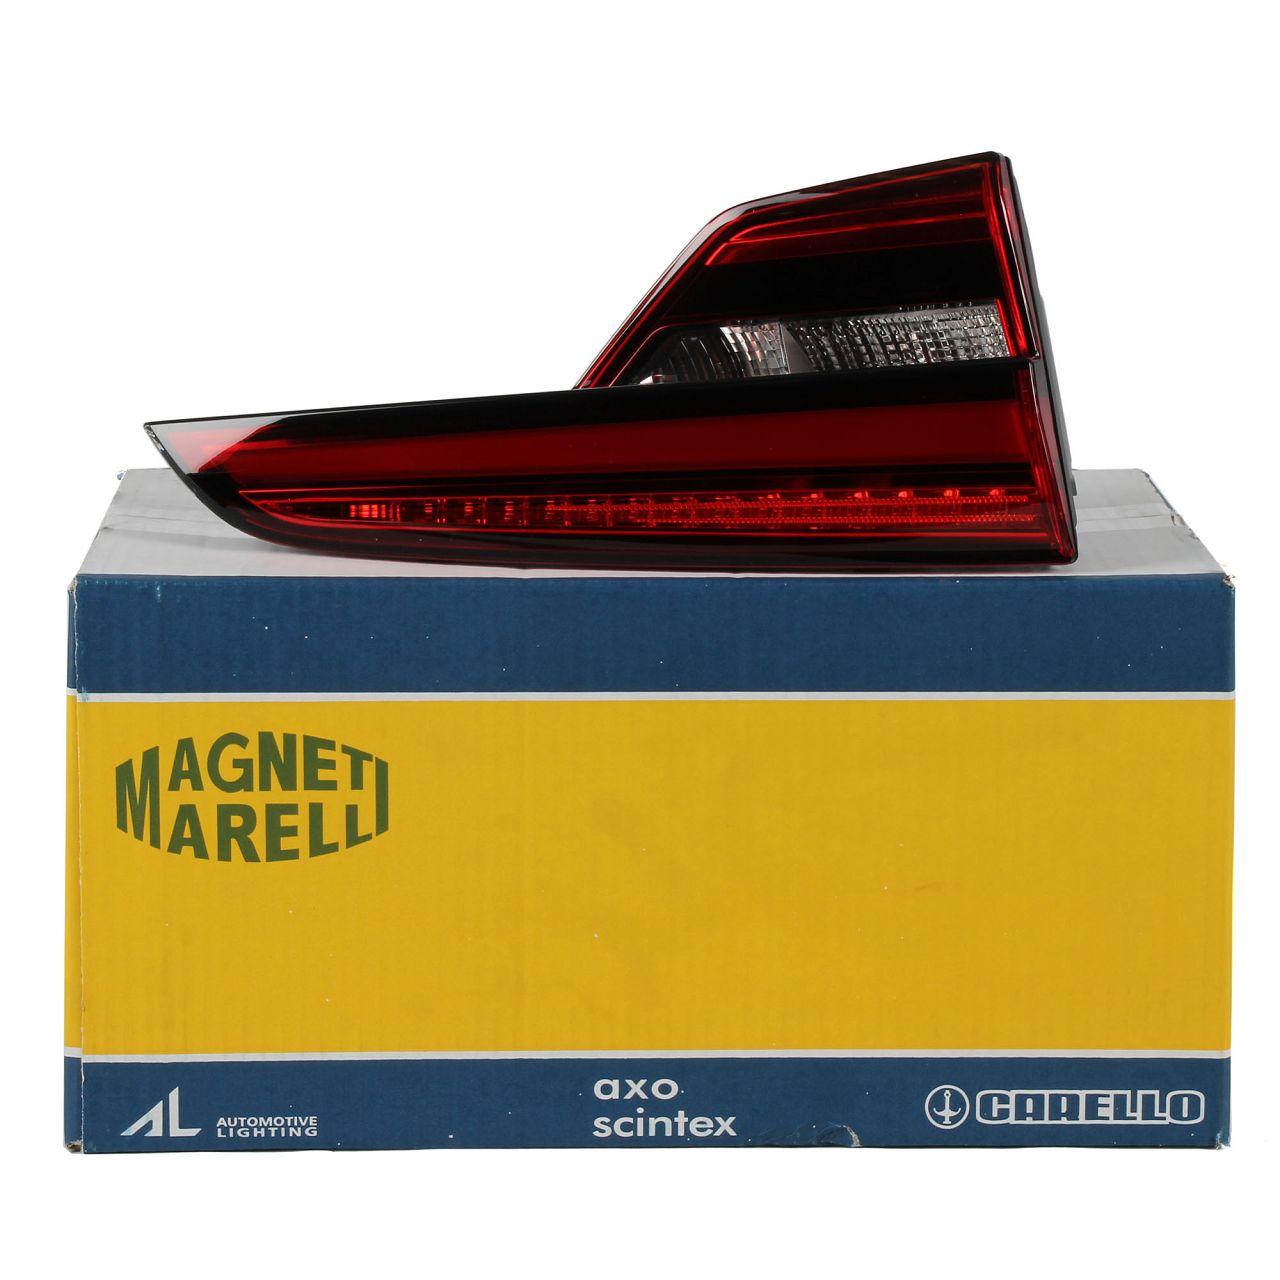 MAGNETI MARELLI Heckleuchte LED für AUDI A4 AVANT (8W5 B9) INNEN LINKS